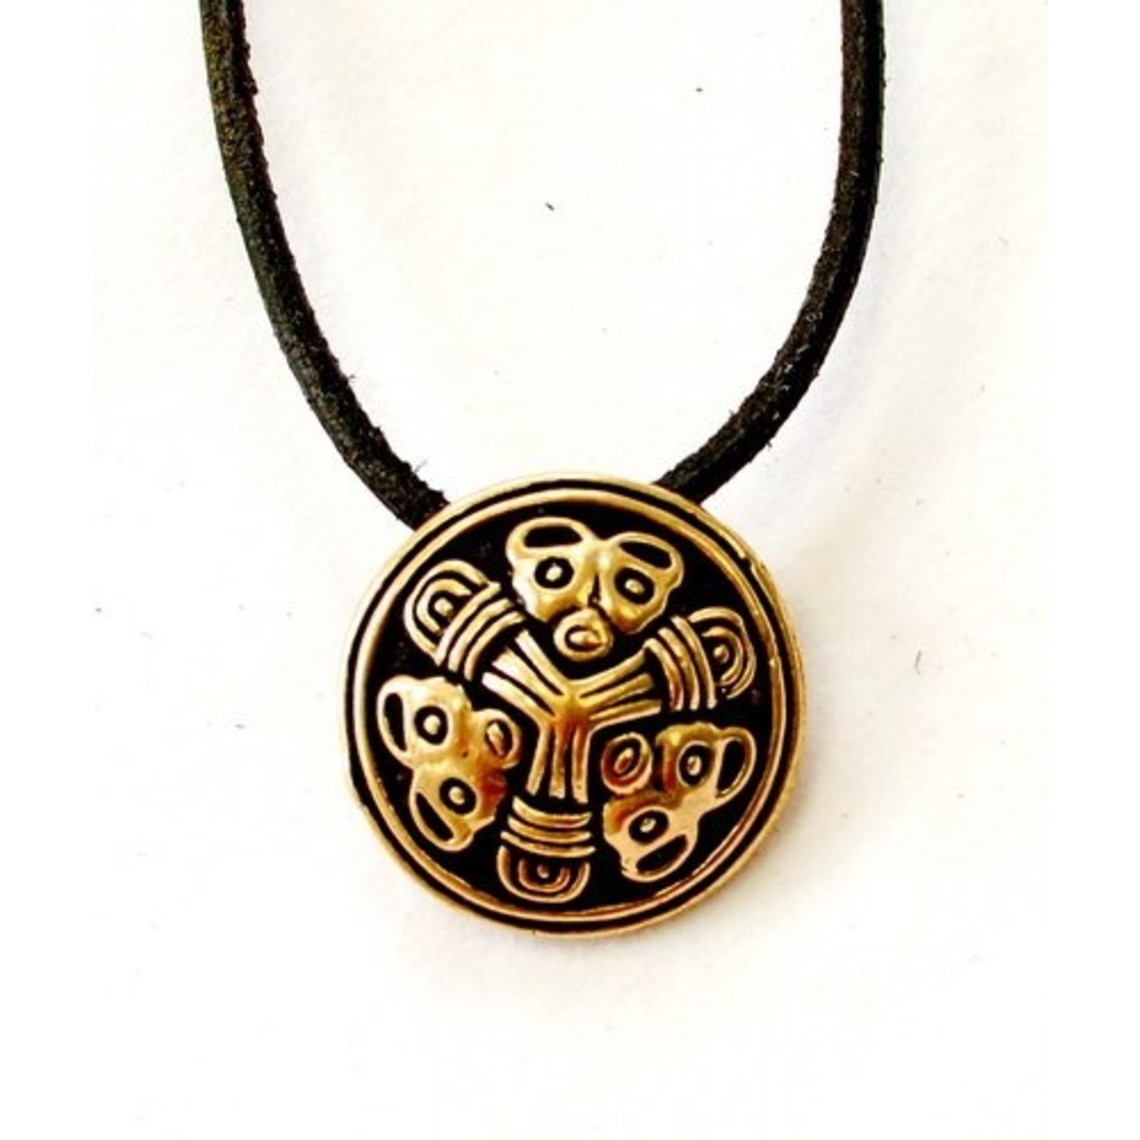 Kleine schijffibula Borrestijl, brons